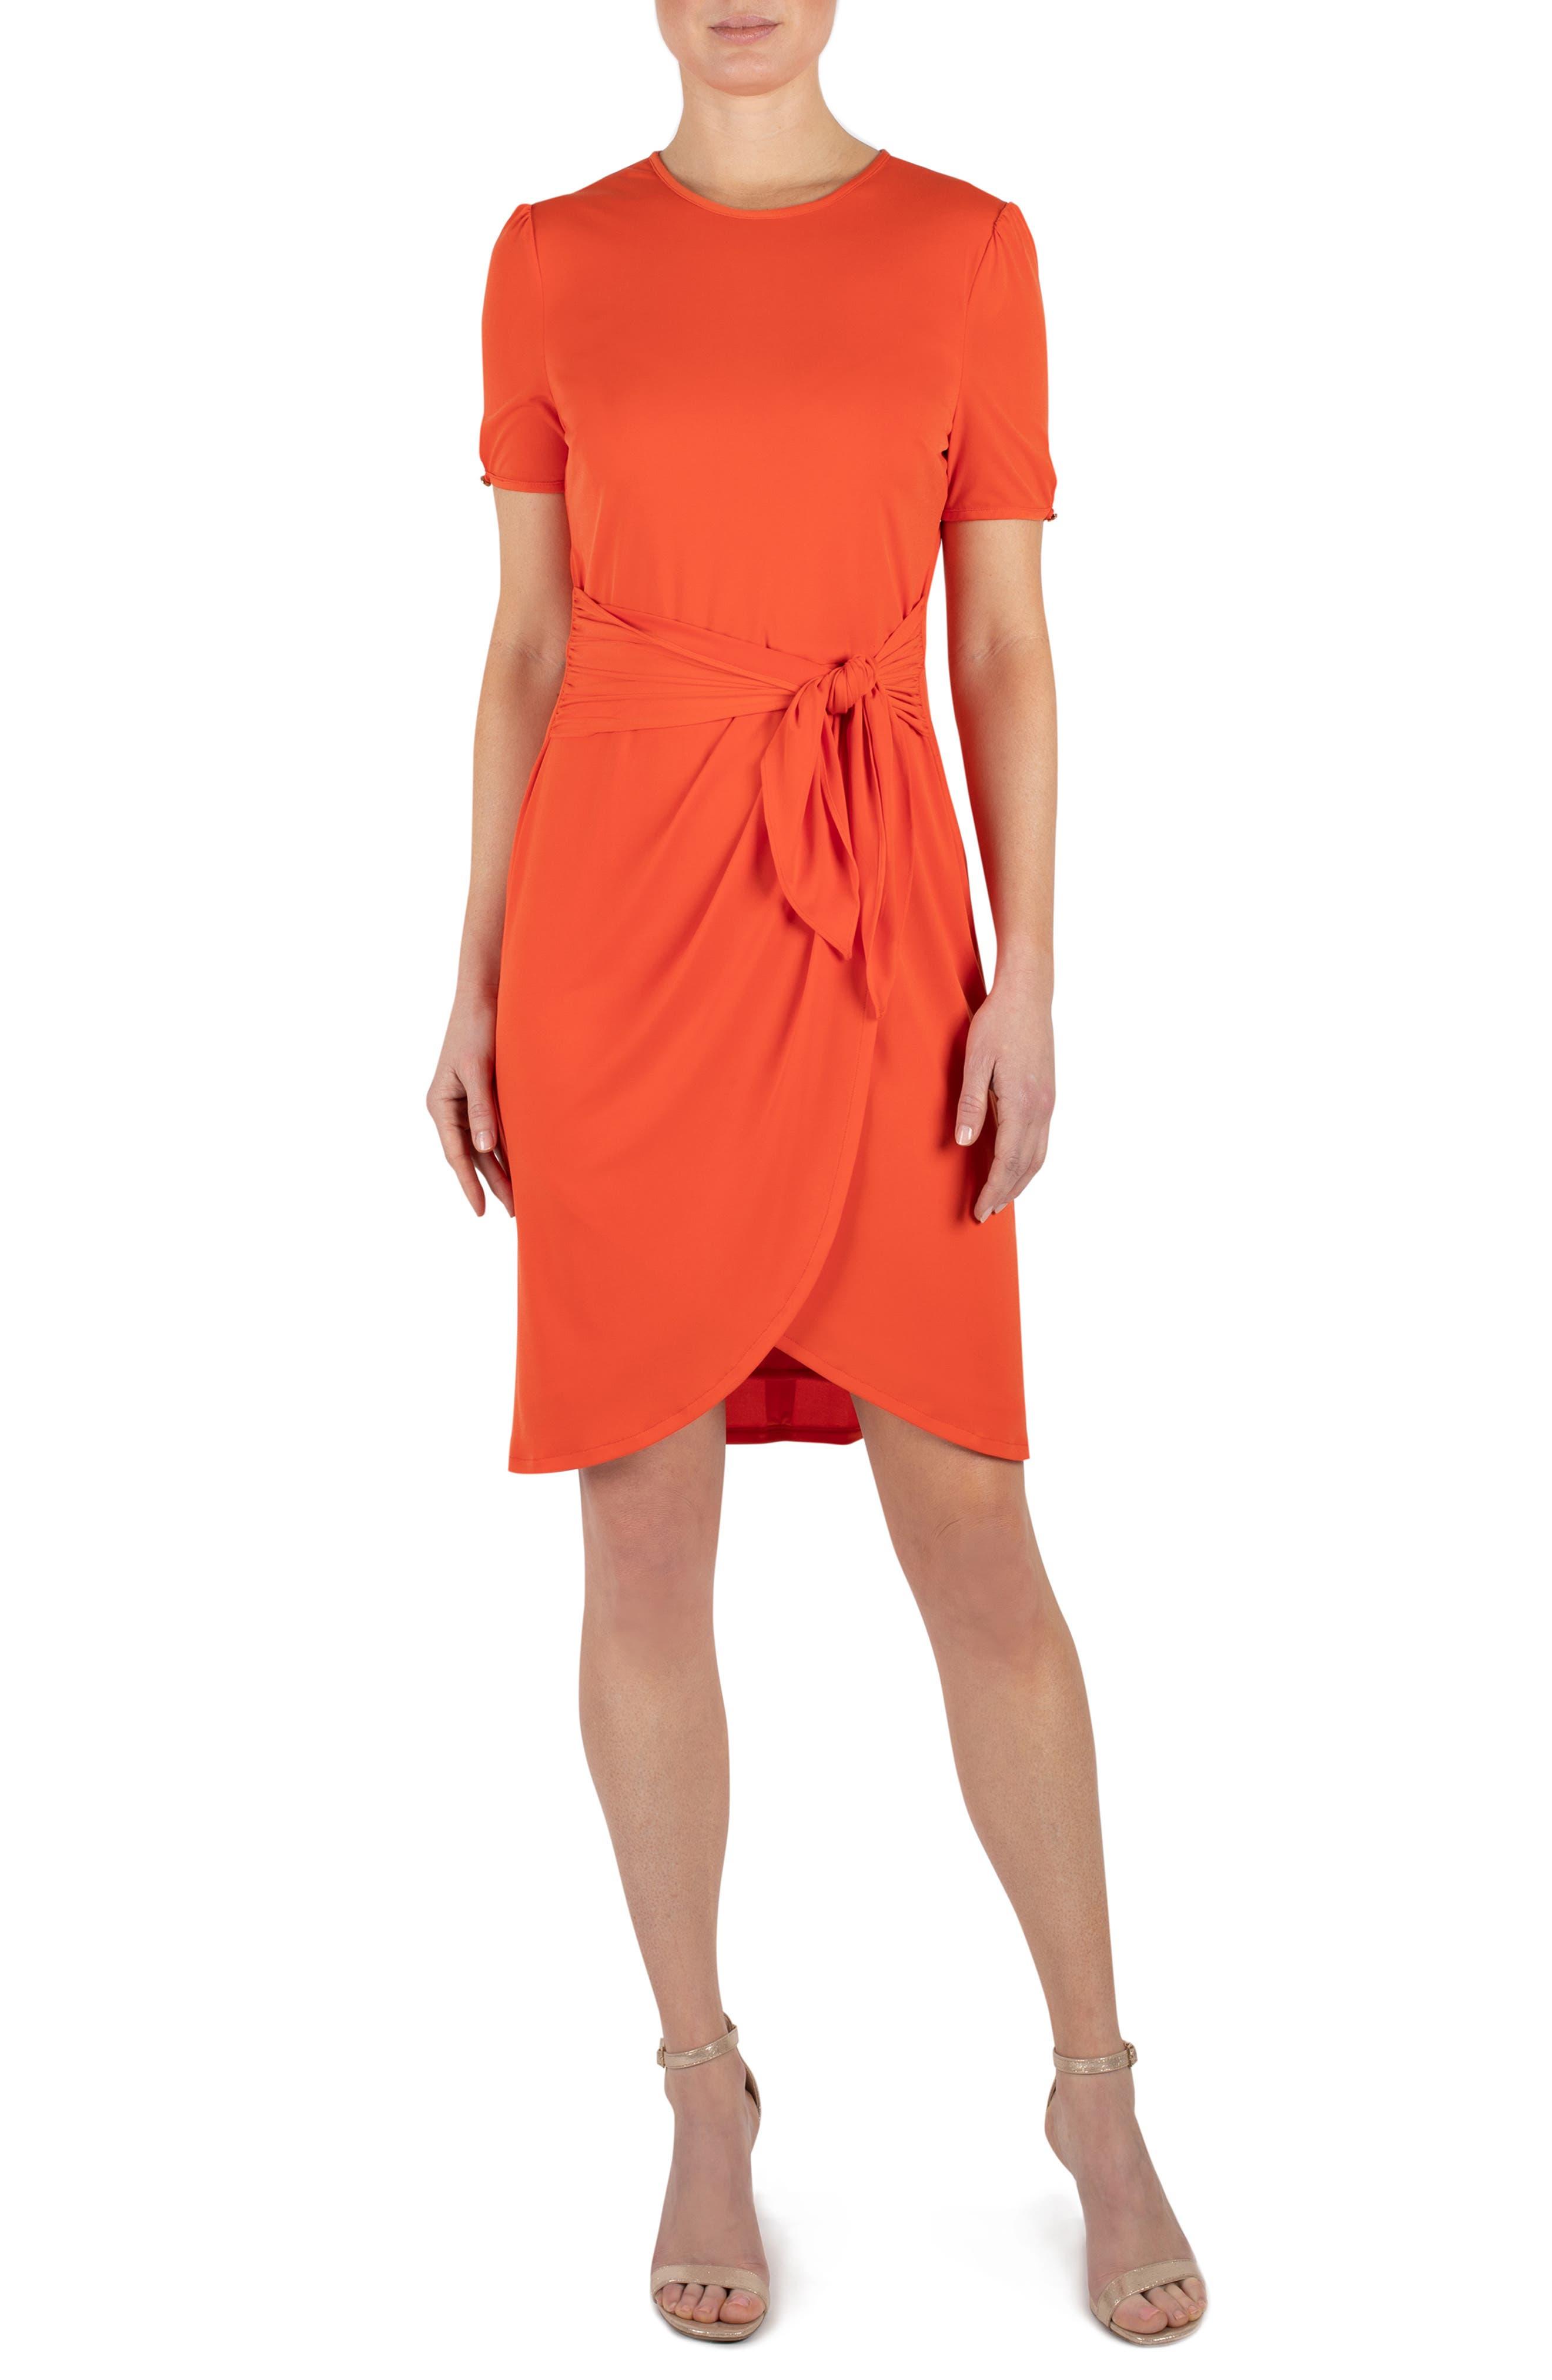 Round Neck Short Sleeve T-Shirt Dress